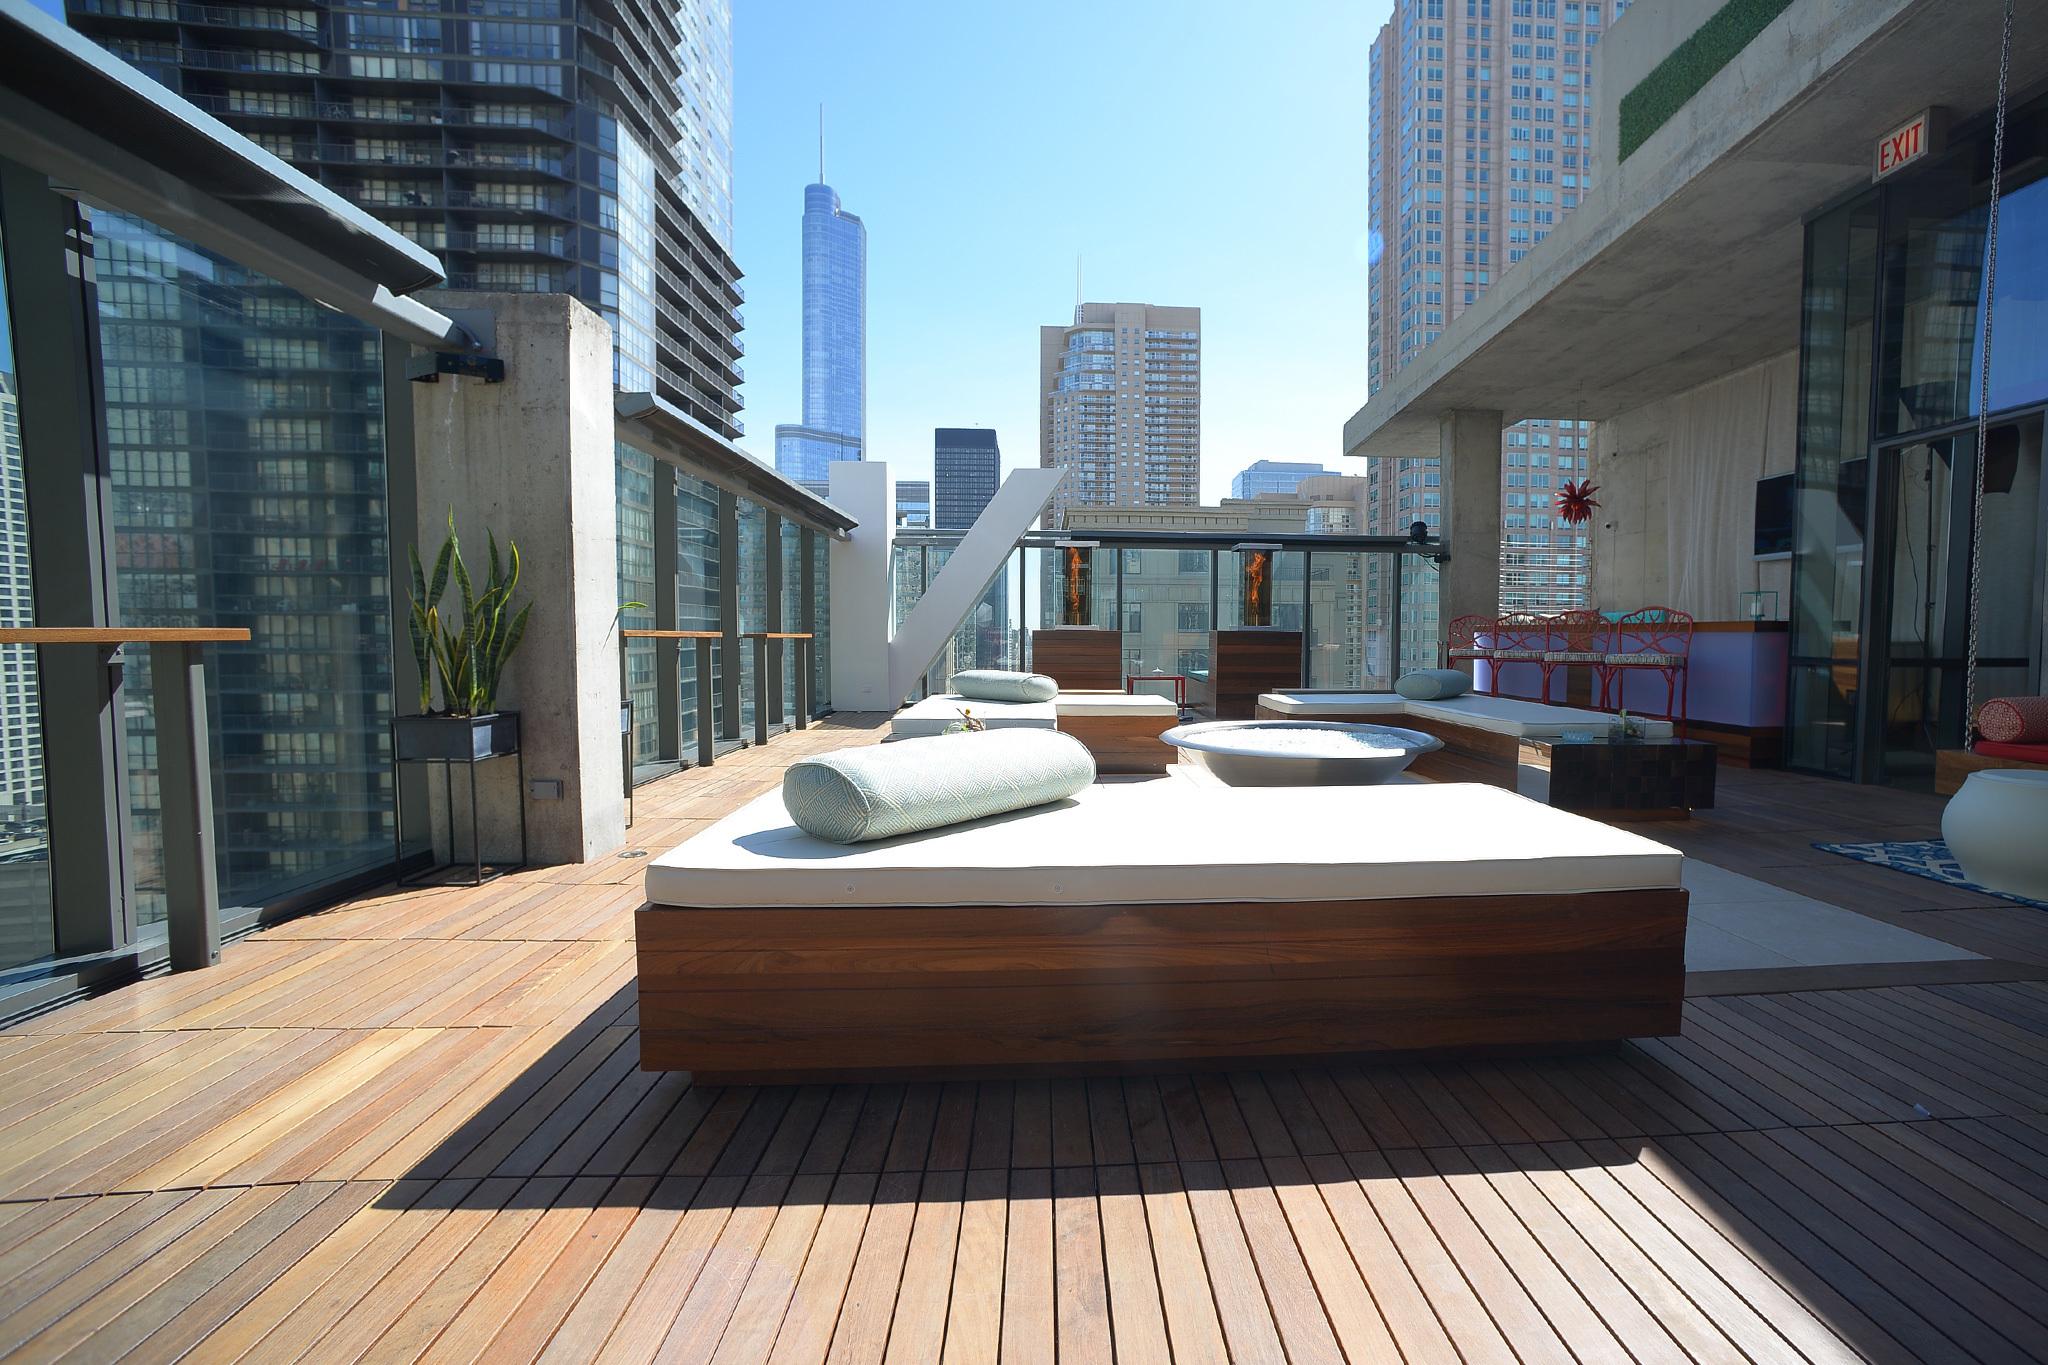 Vertigo Sky Lounge Closed Bars In River North Chicago